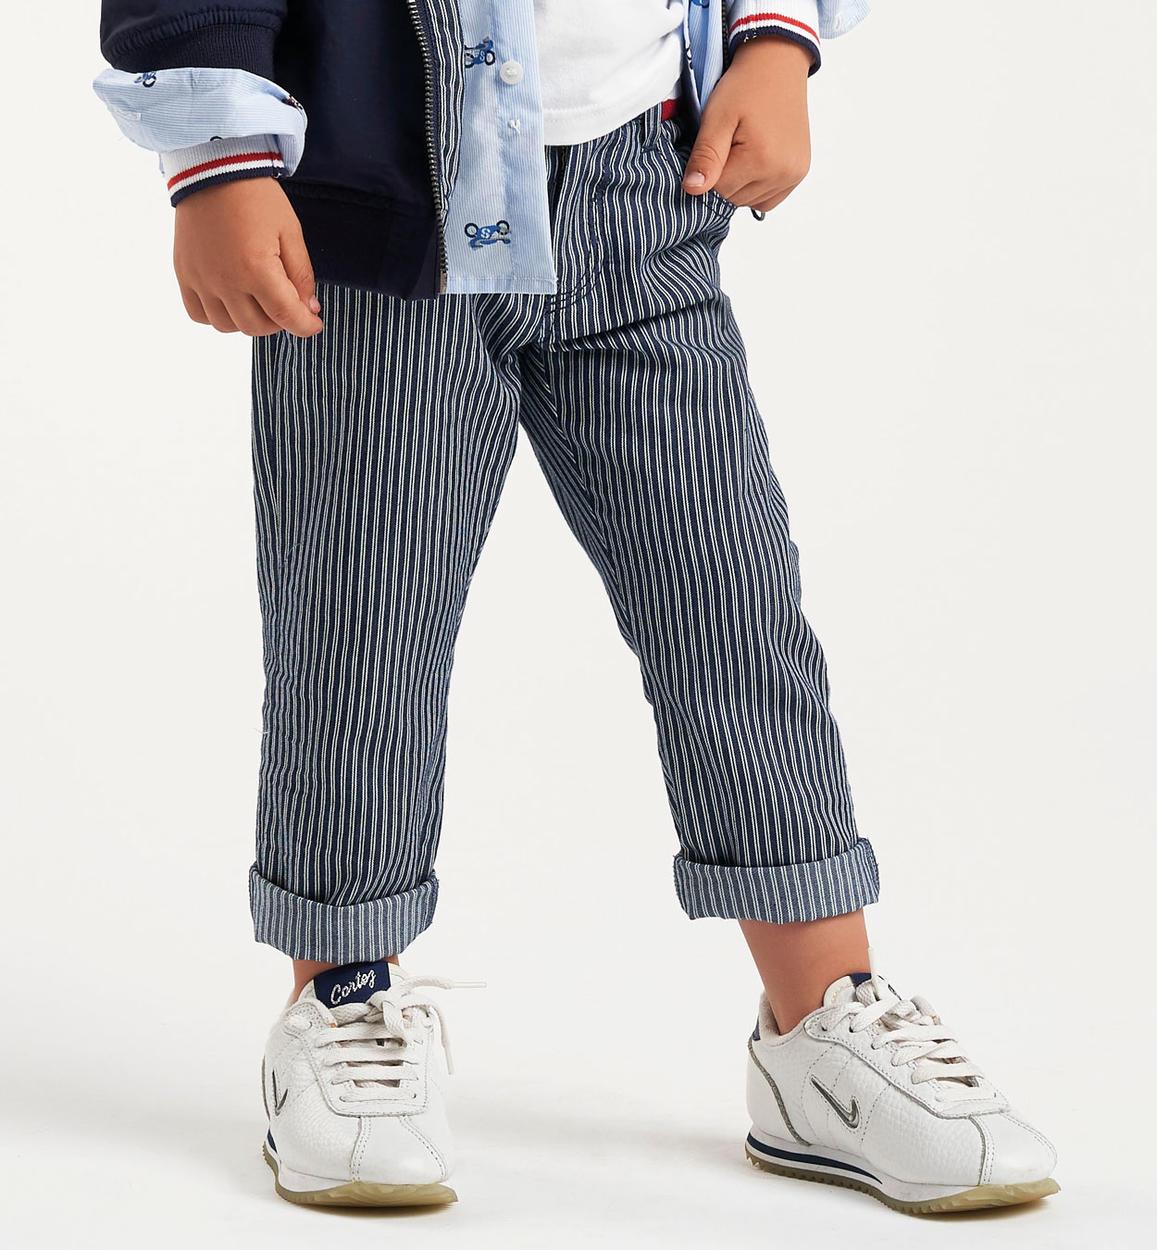 40ba003b9d3f Pantalone in cotone a righe per bambino da 6 mesi a 7 anni Sarabanda NAVY-